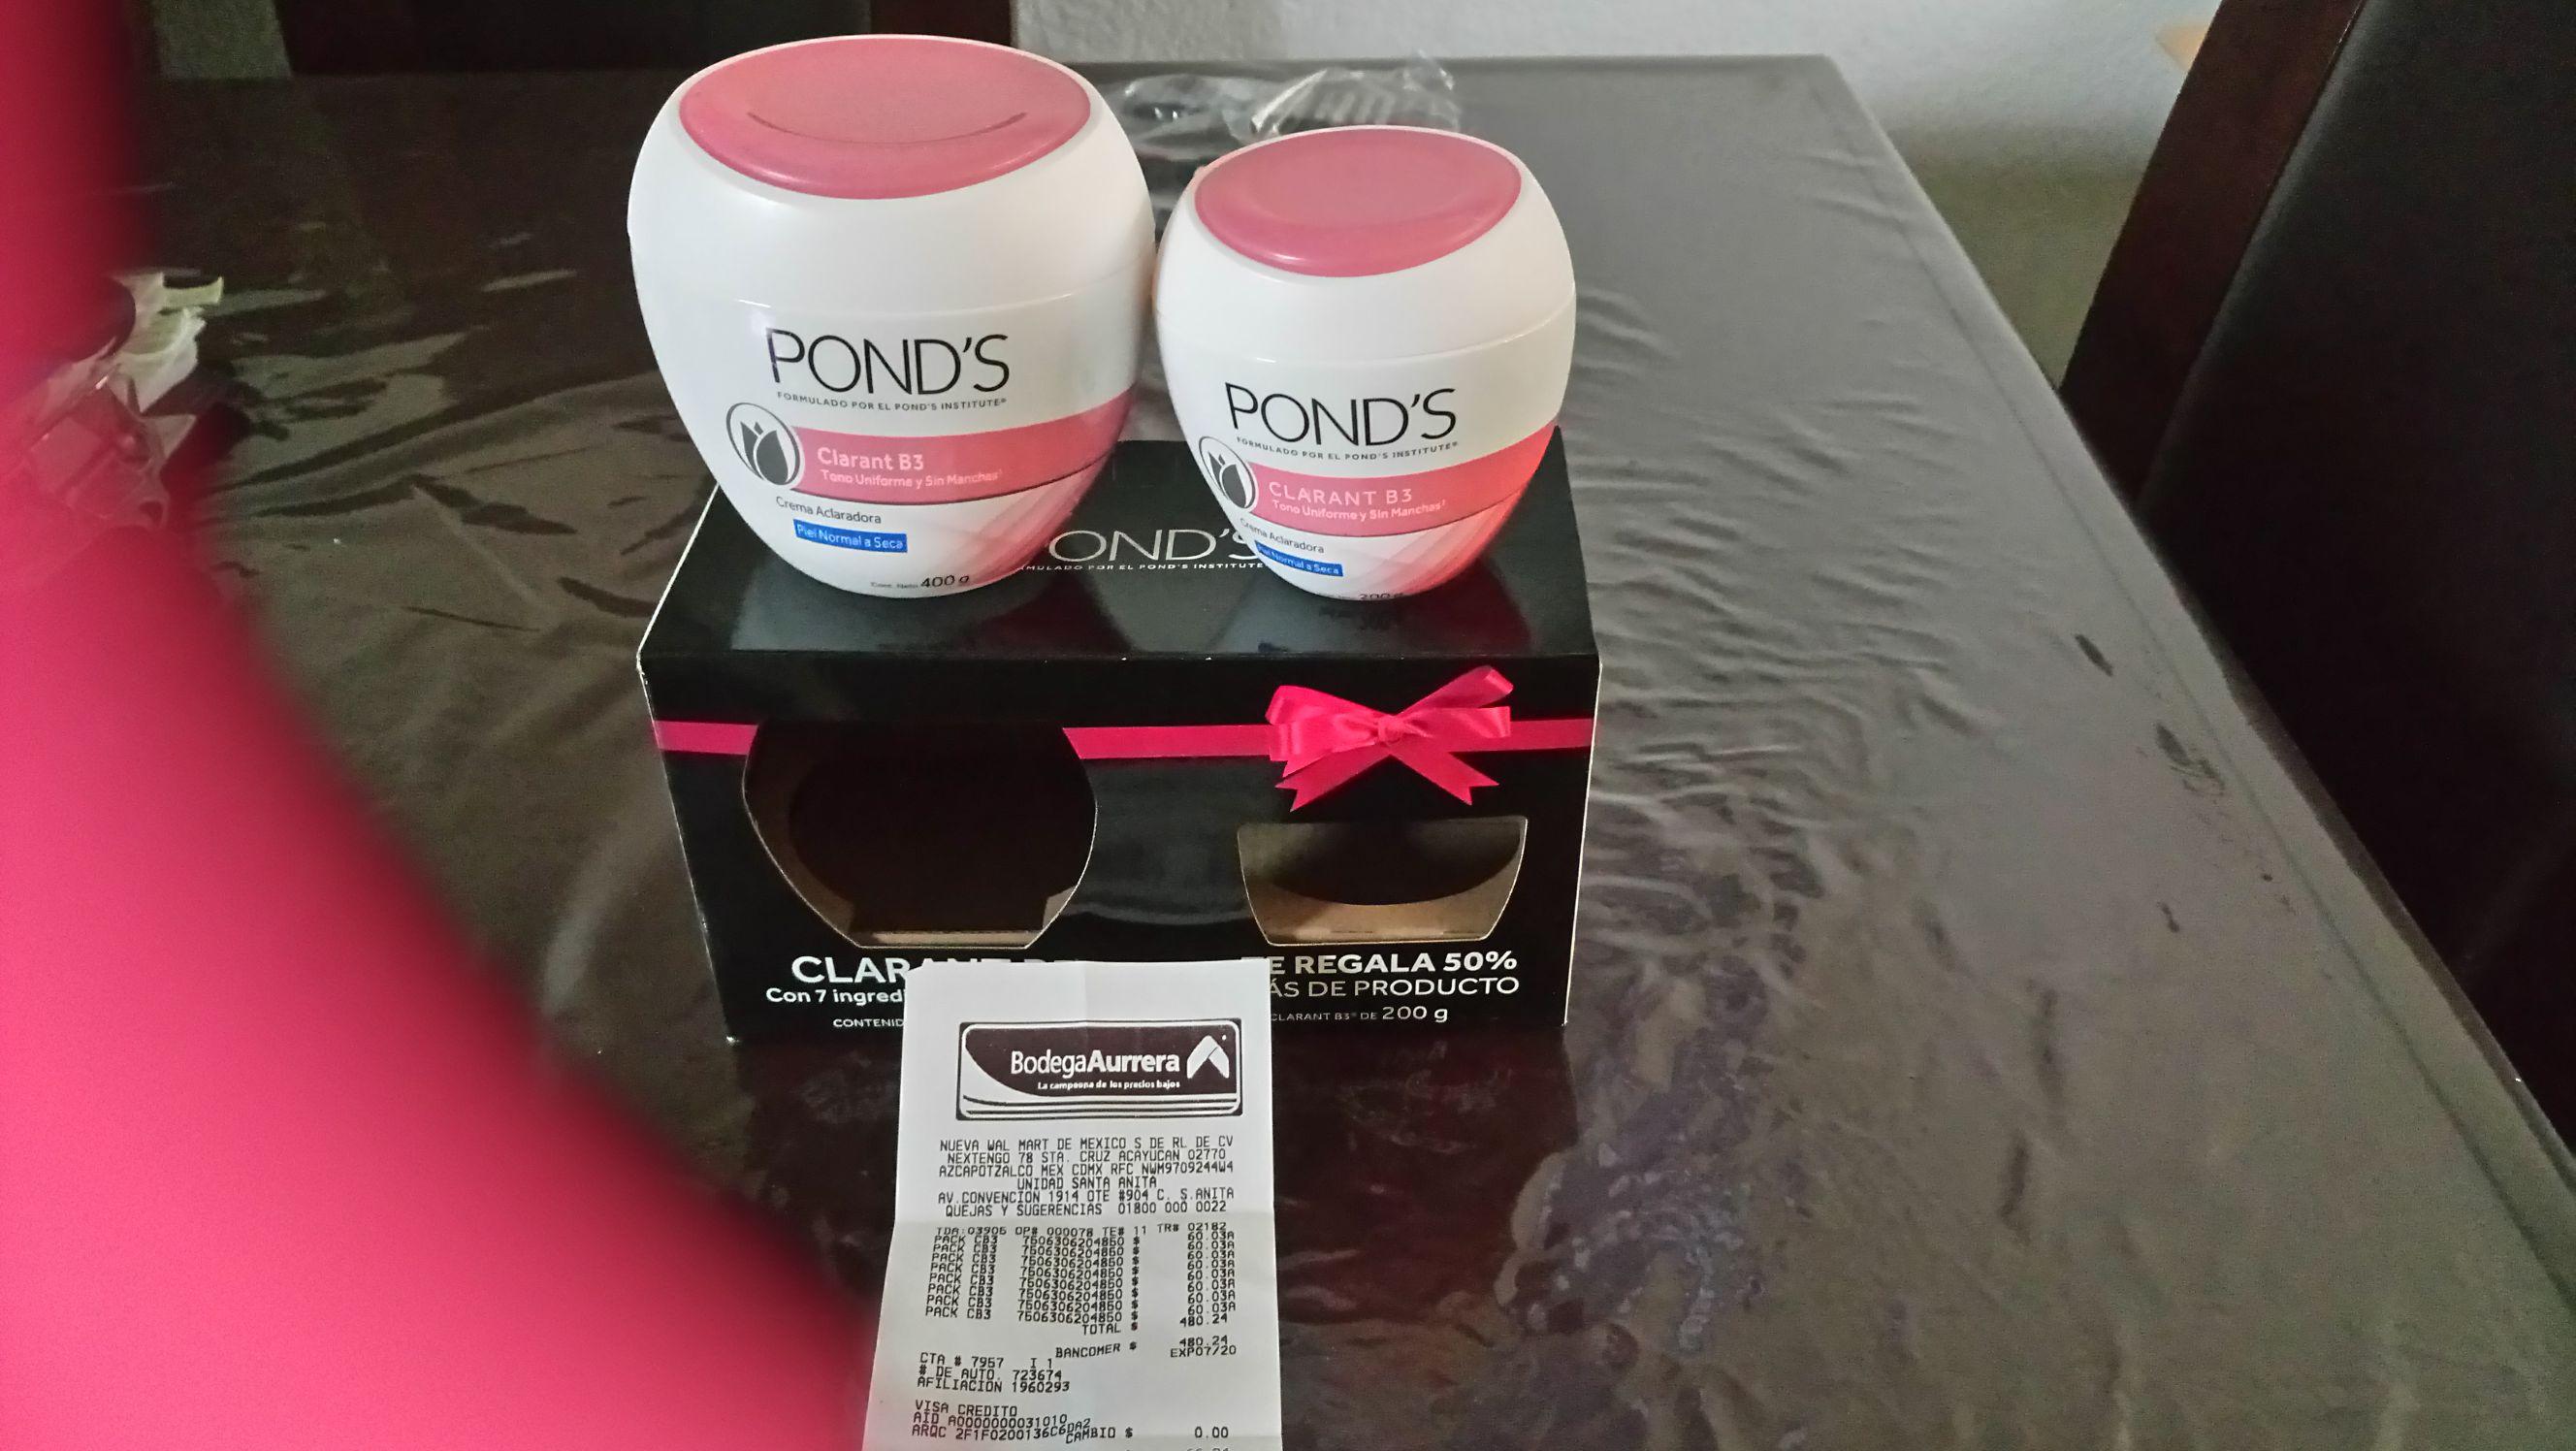 Bodega Aurrerá: Paquete de crema ponds aclarante 400 y 200 gr